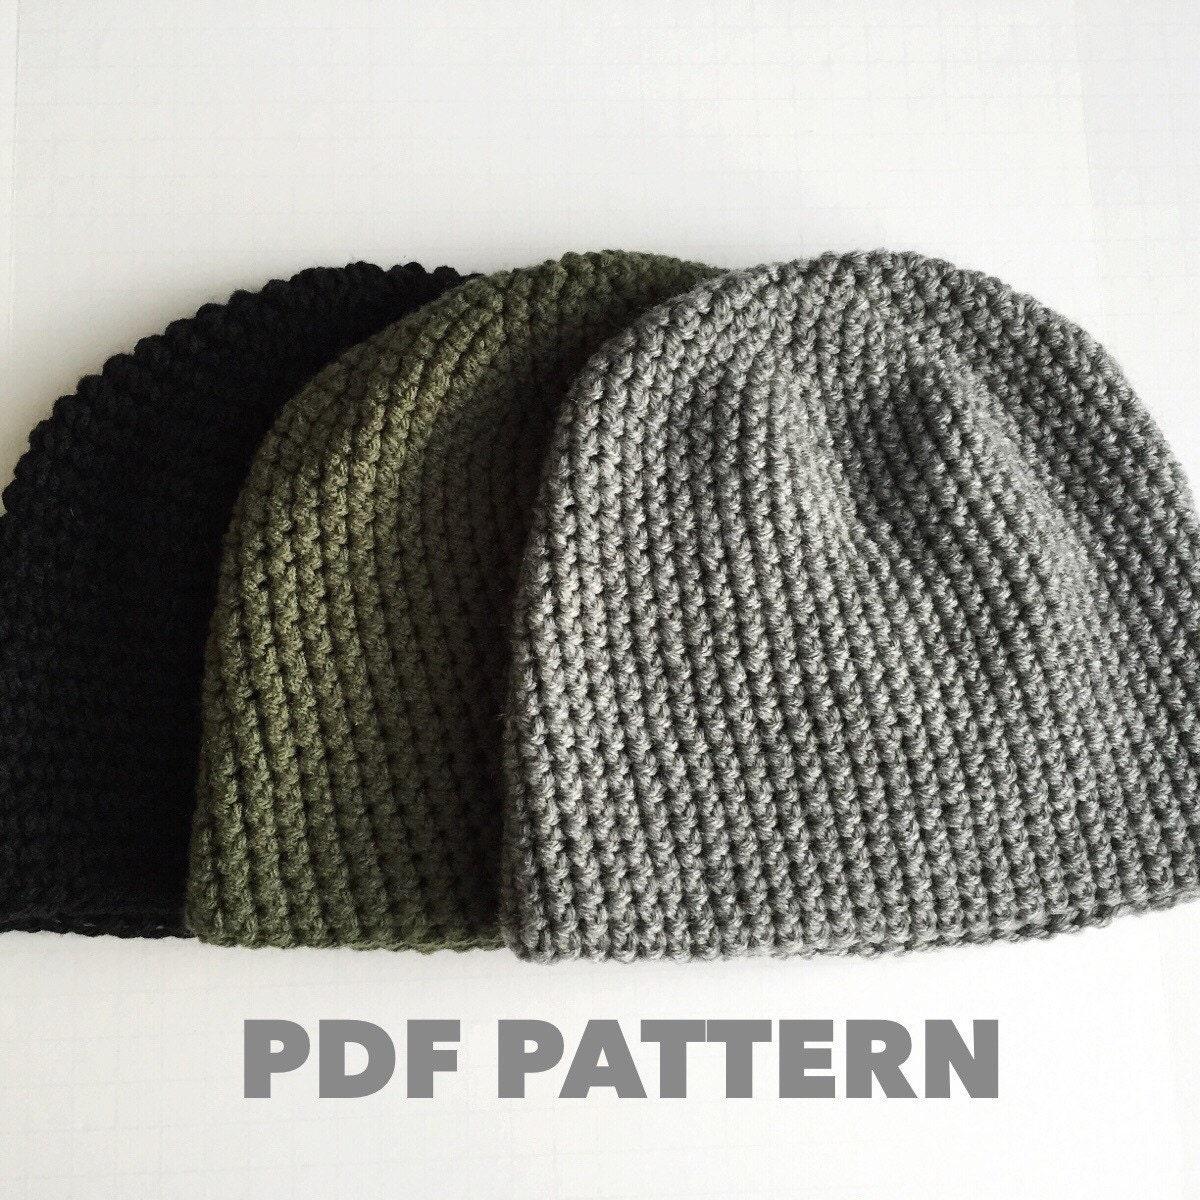 Mens Crochet Hat Patterns New Inspiration Ideas